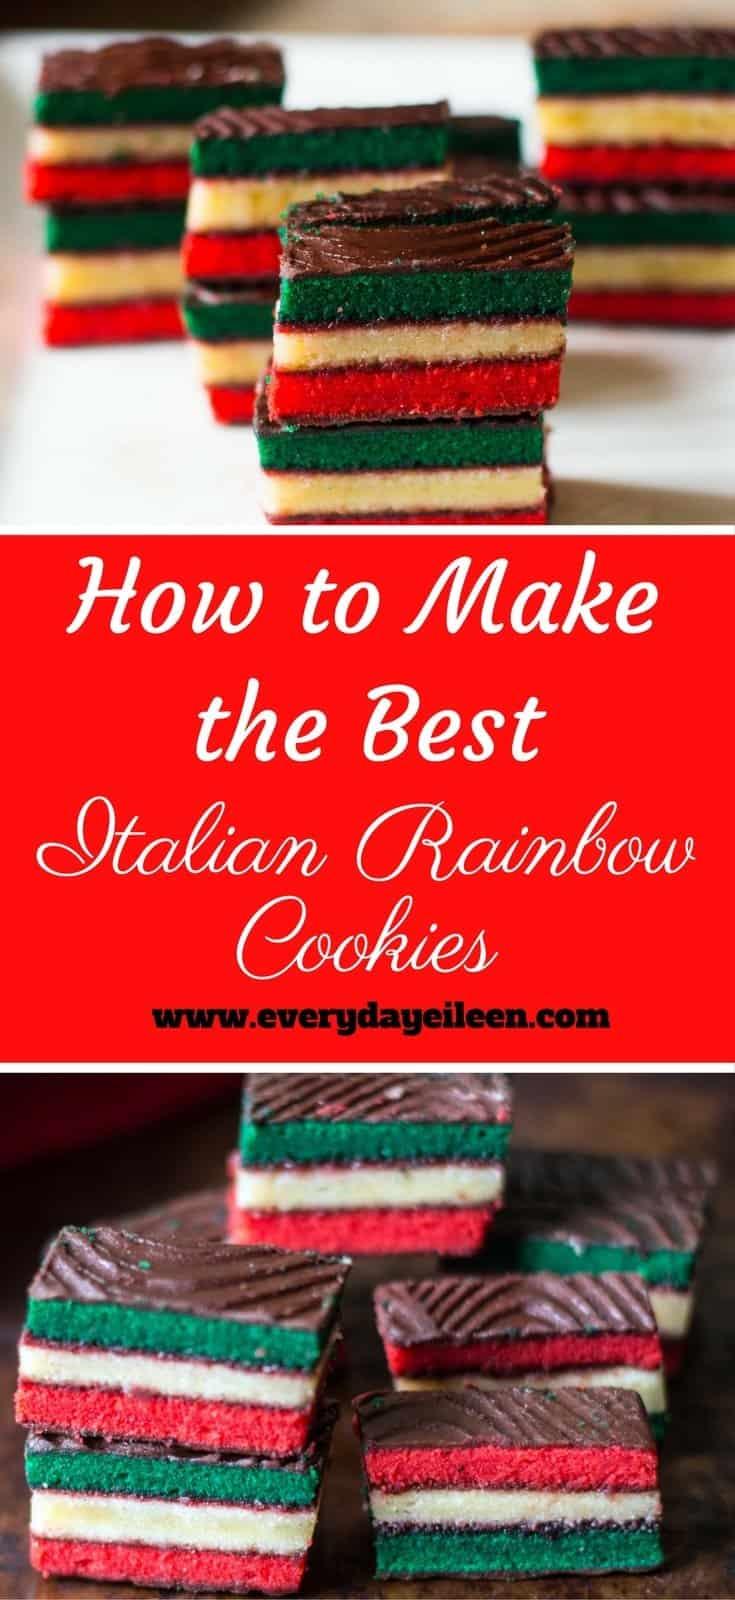 How to Make the Best Italian Rainbow Cookies